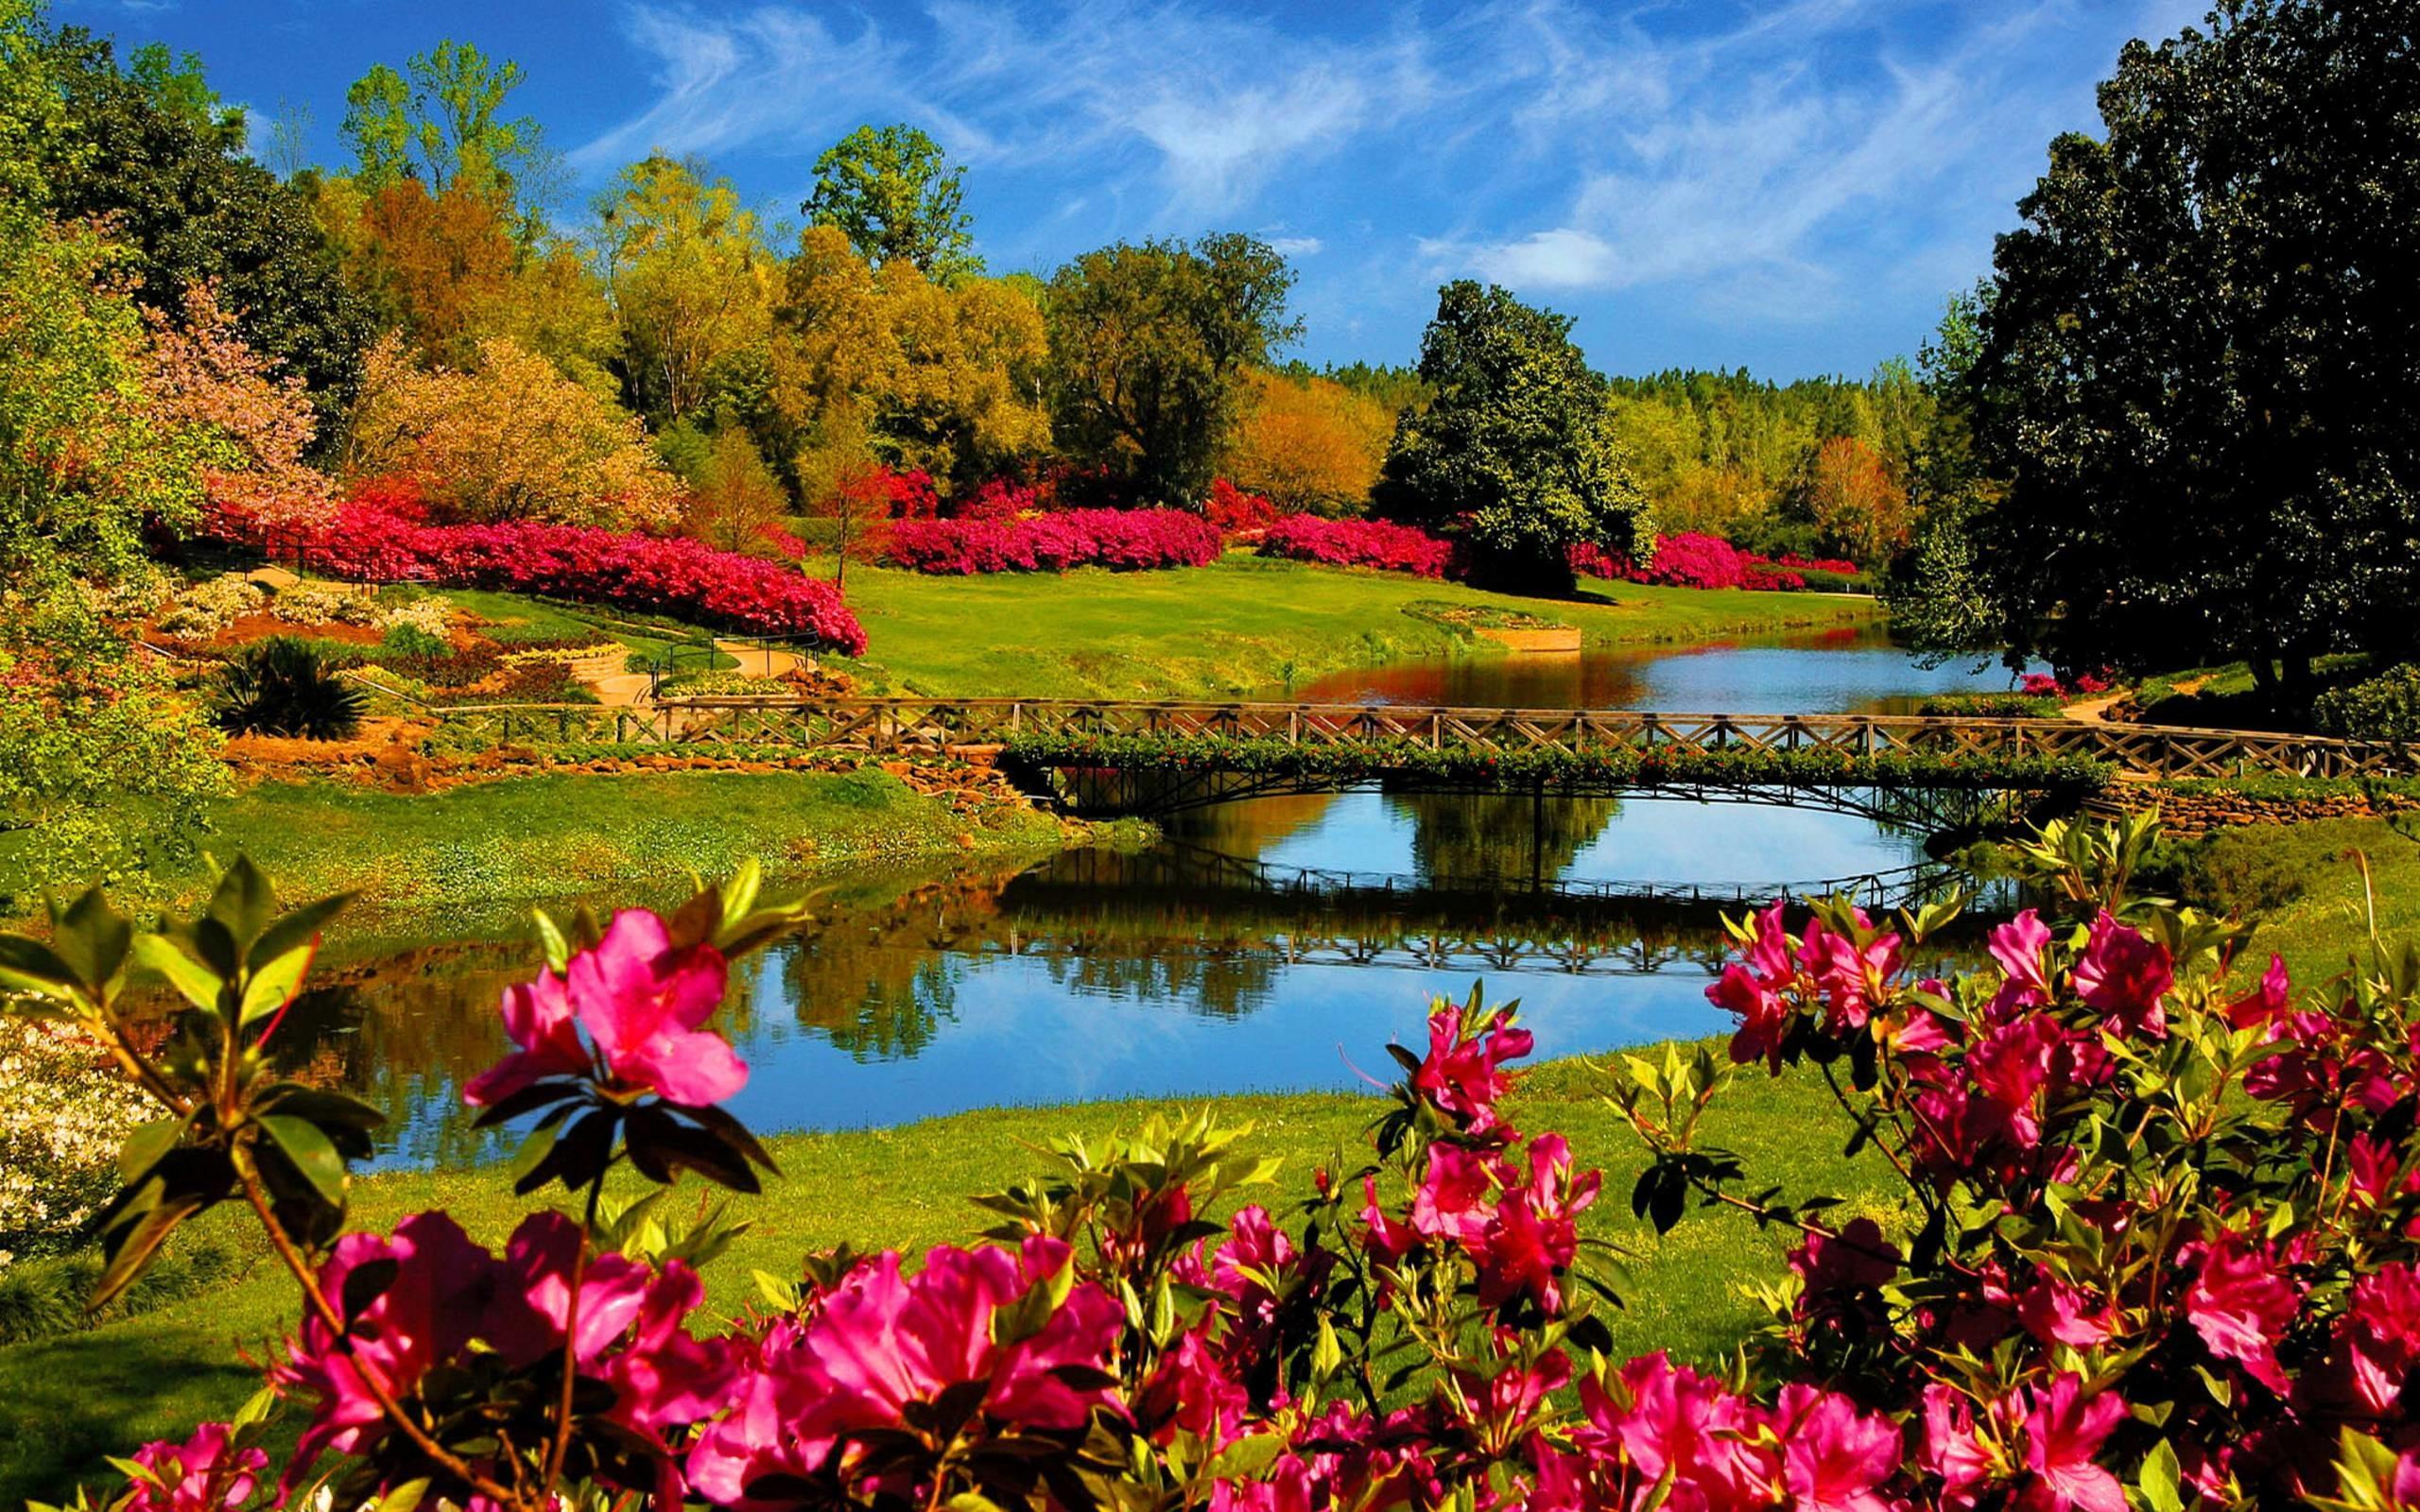 Springtime Wallpaper Desktop 61 images 2560x1600